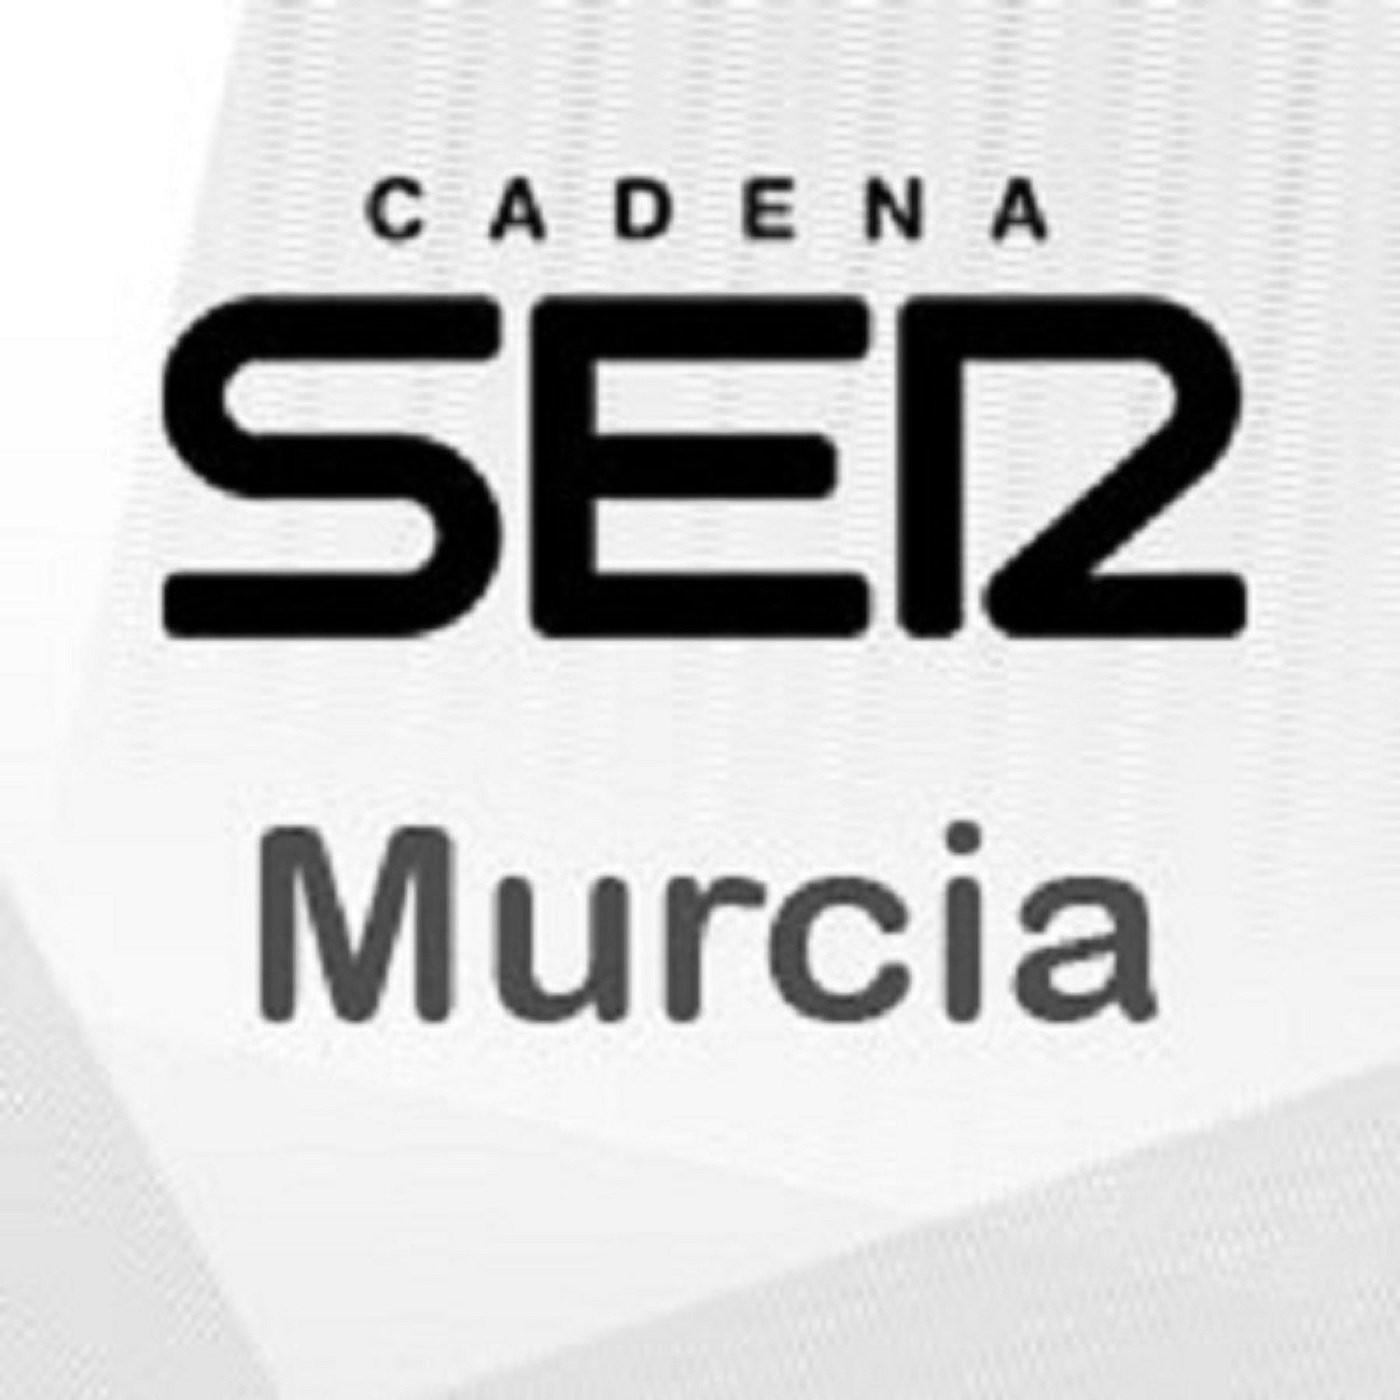 Radio Murcia - Cadena SER